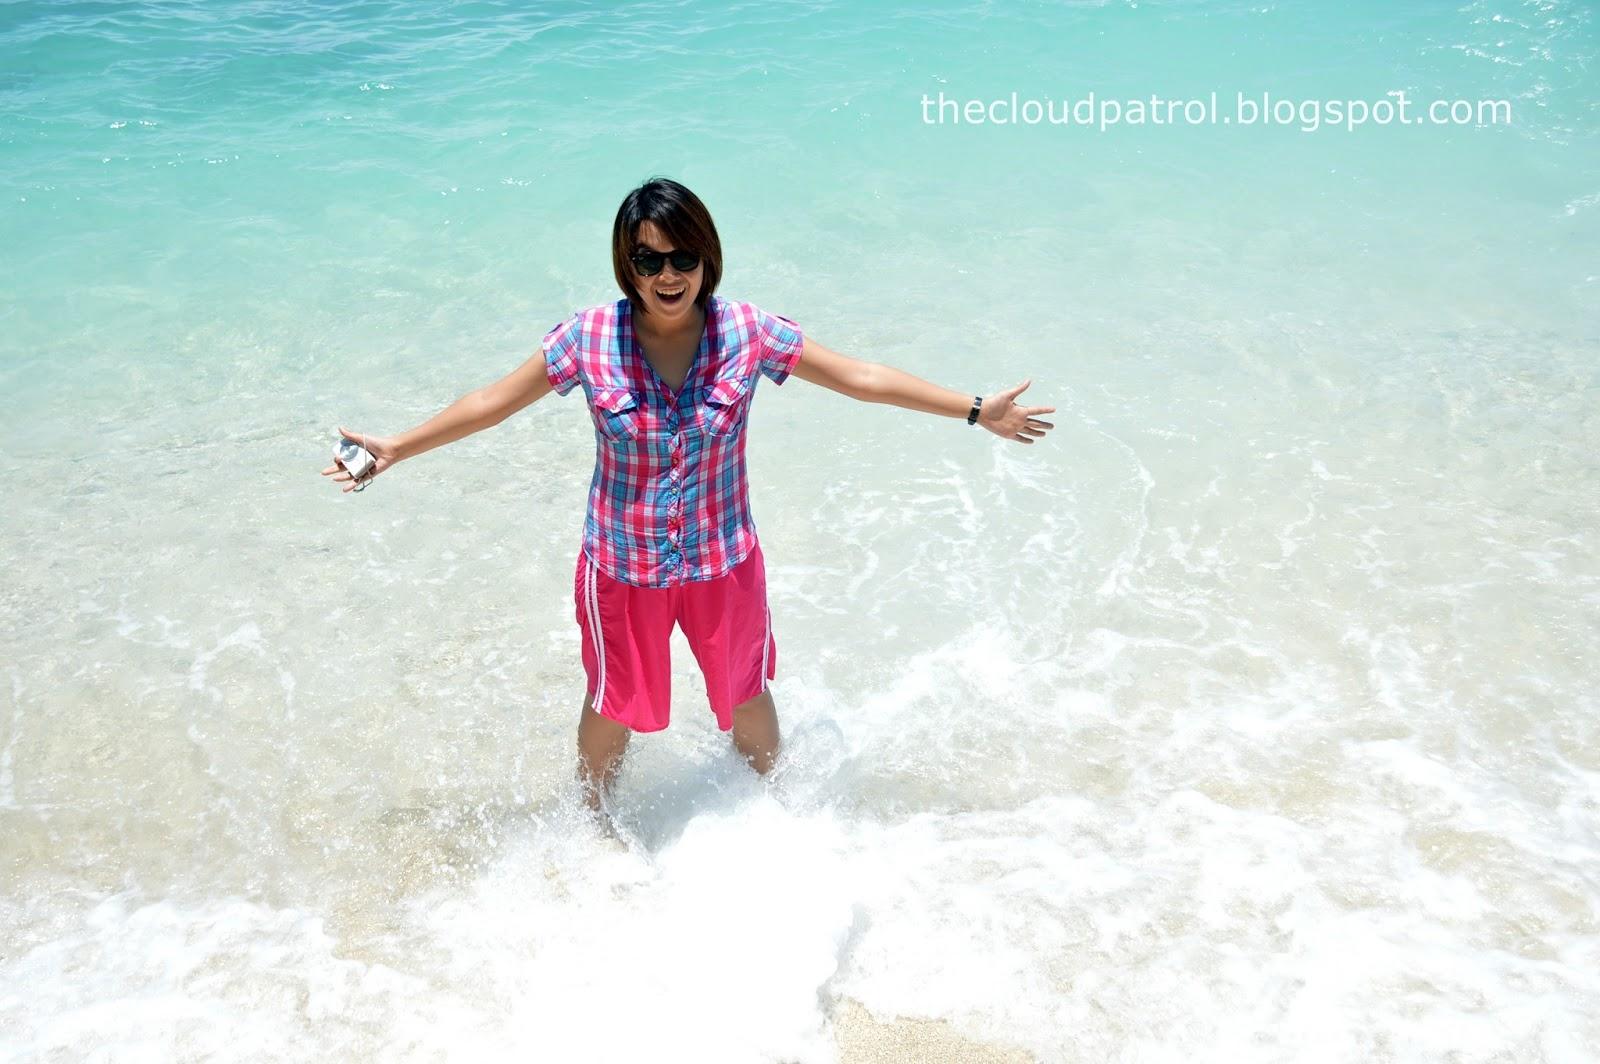 Butanding, whale shark, cebu, oslob, philippines, beach, white sand, tropical, vacation